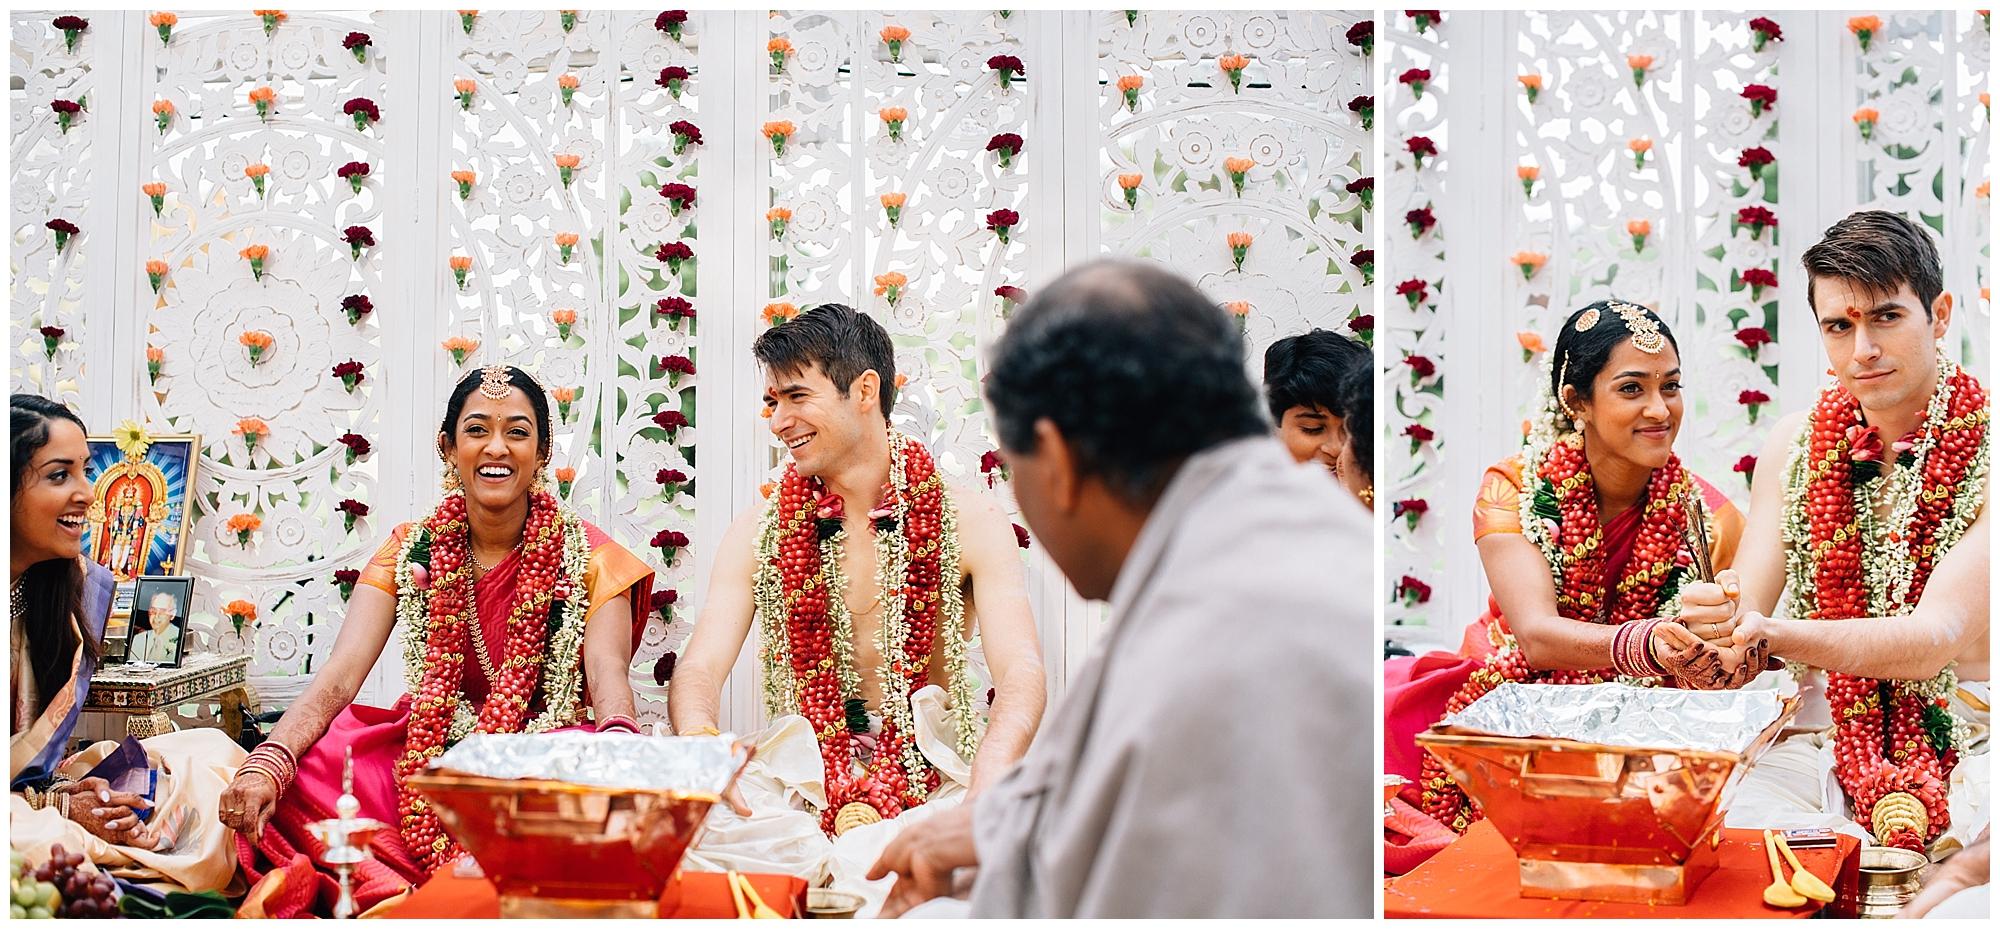 Indian-Wedding-Photographer-Raleigh-40-1.jpg